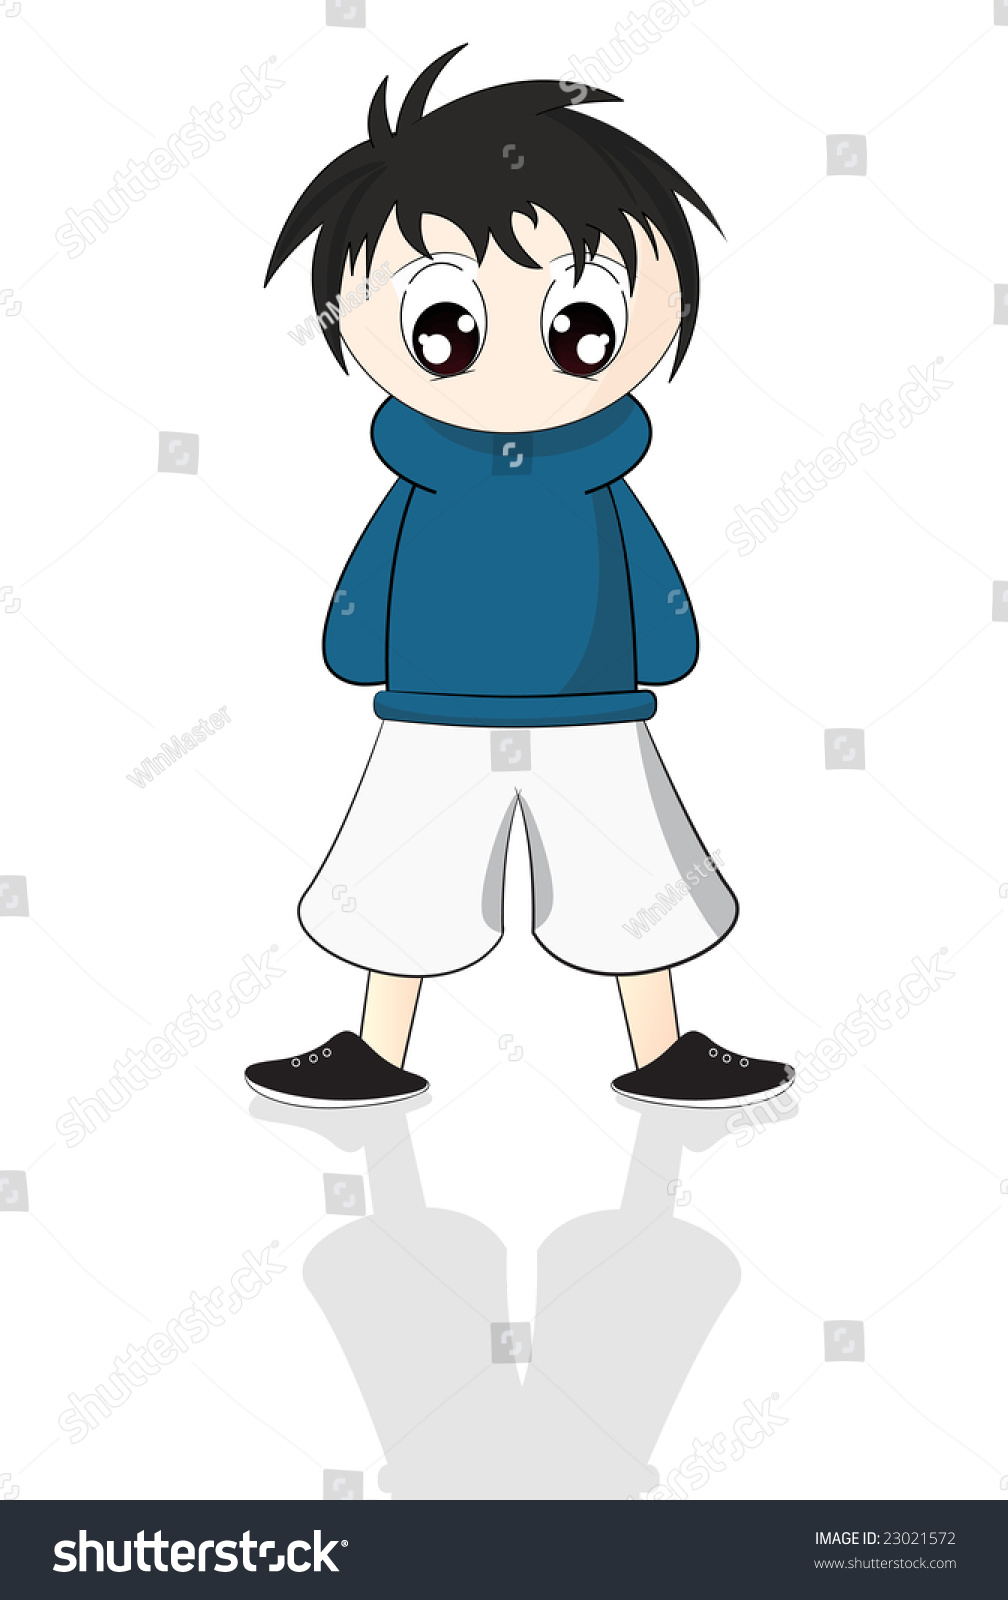 Cute anime boy kid